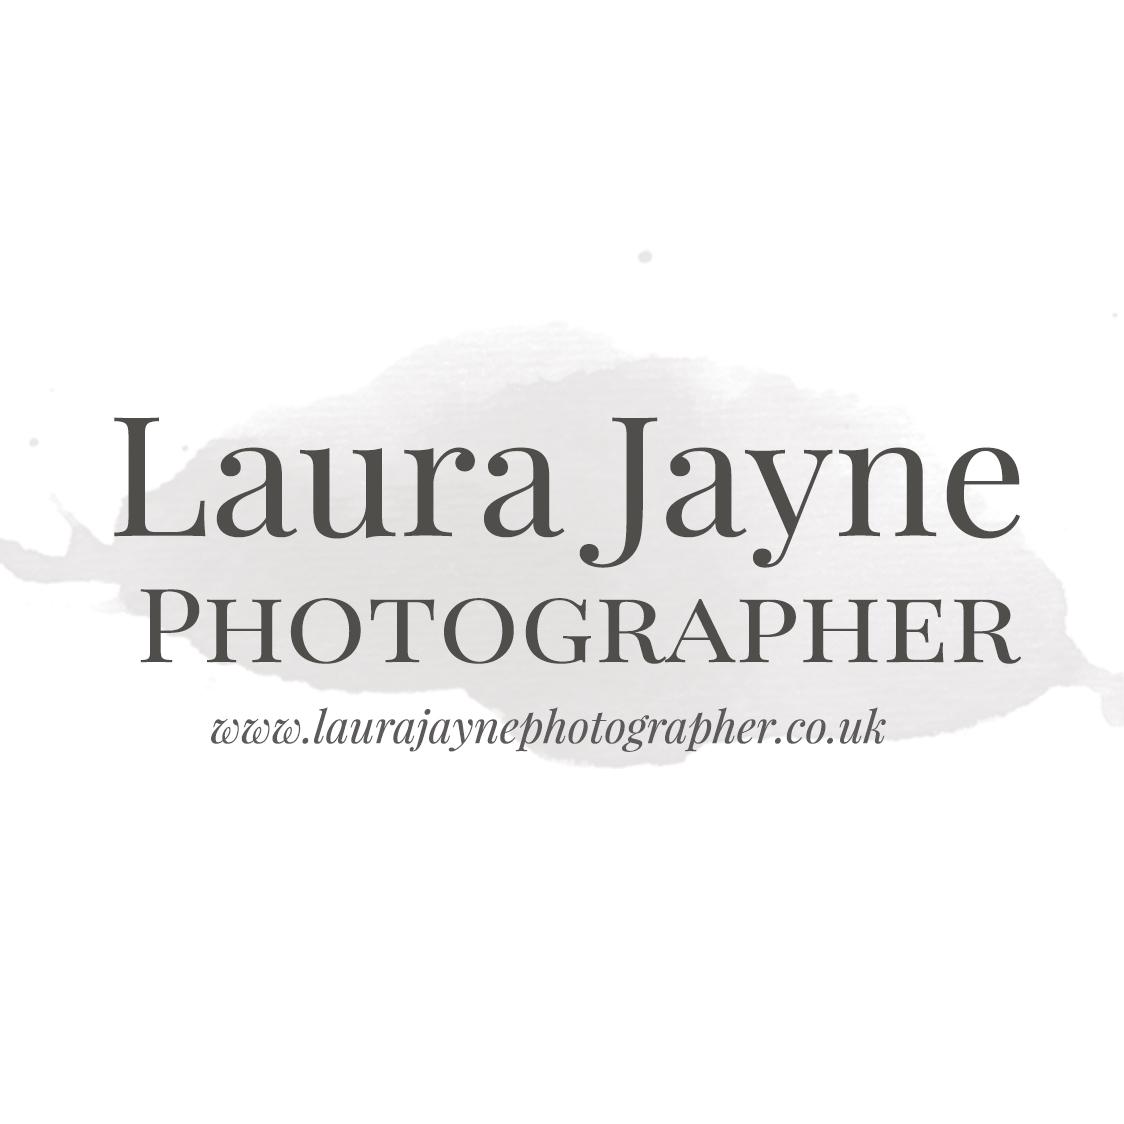 Laura Jayne Photographer